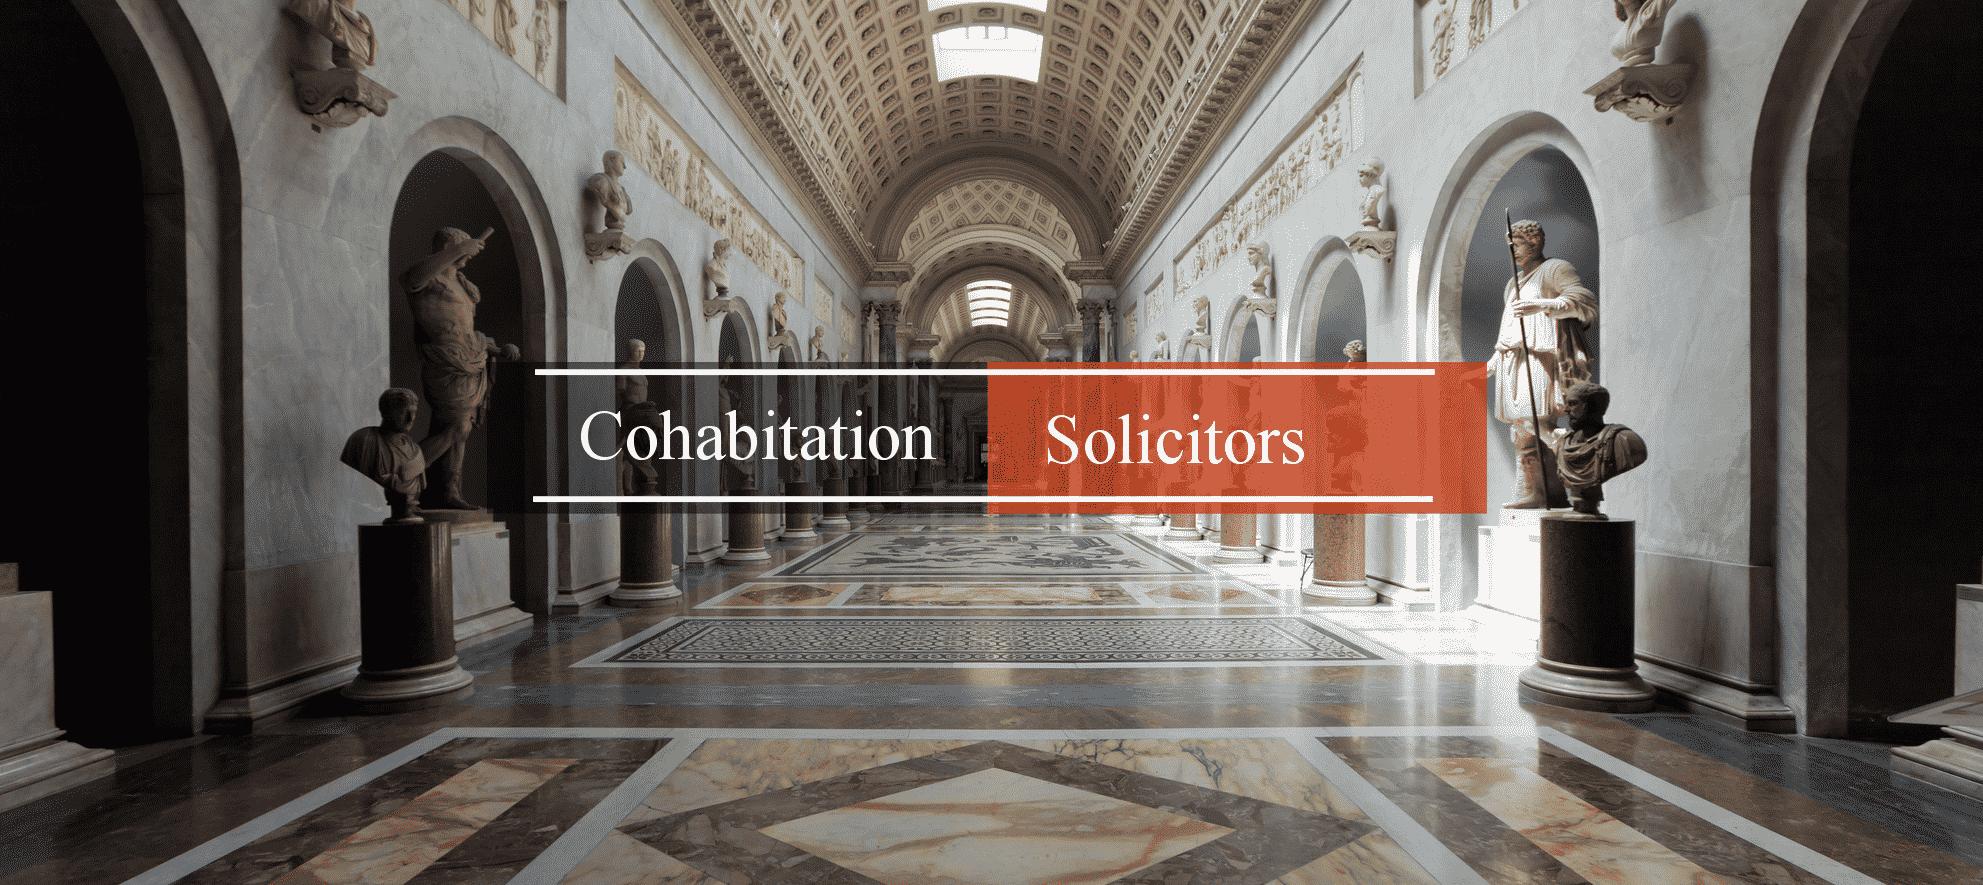 cohabitation solicitors